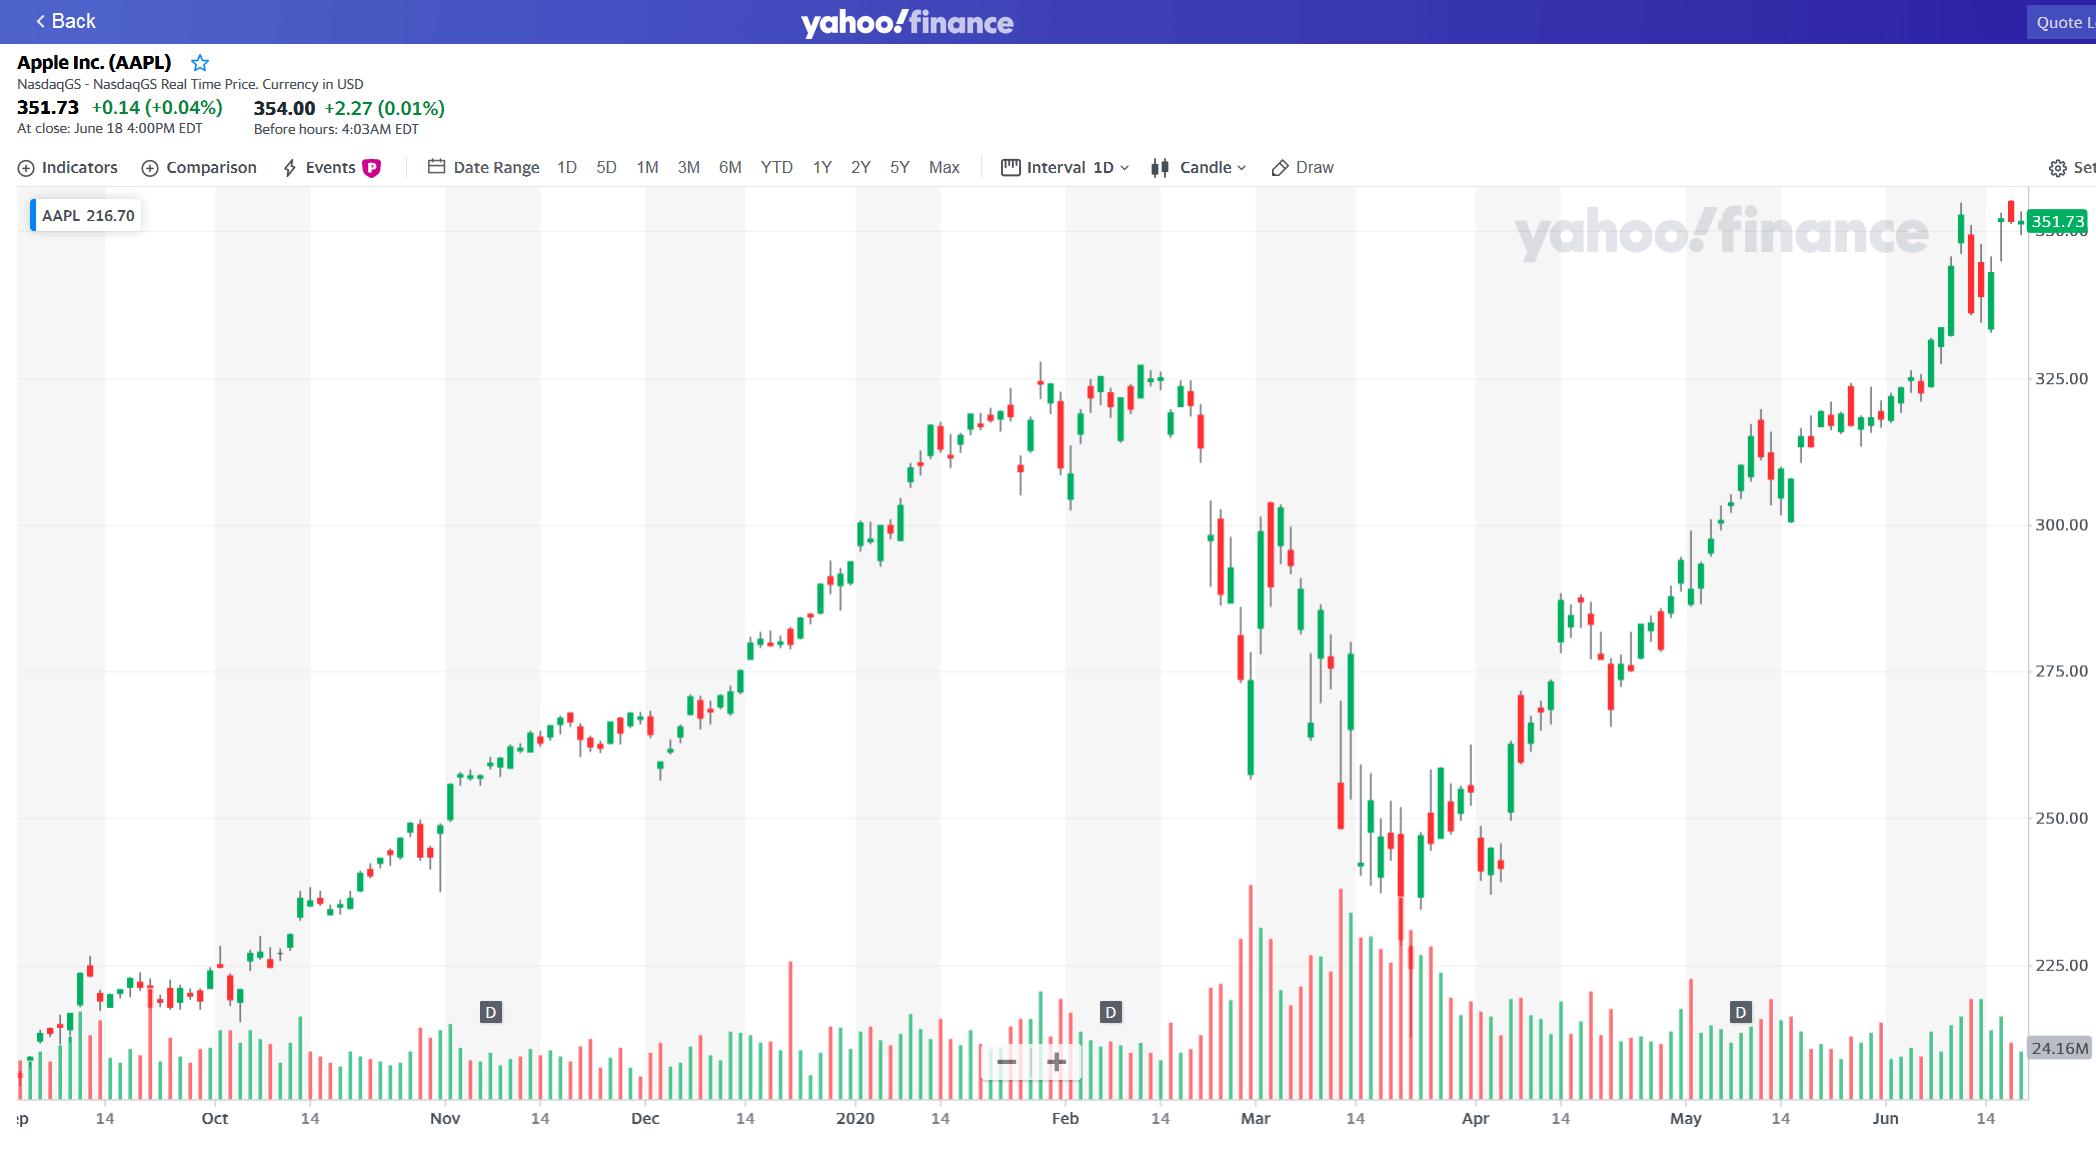 Yahoo Finance Free Stock Charts